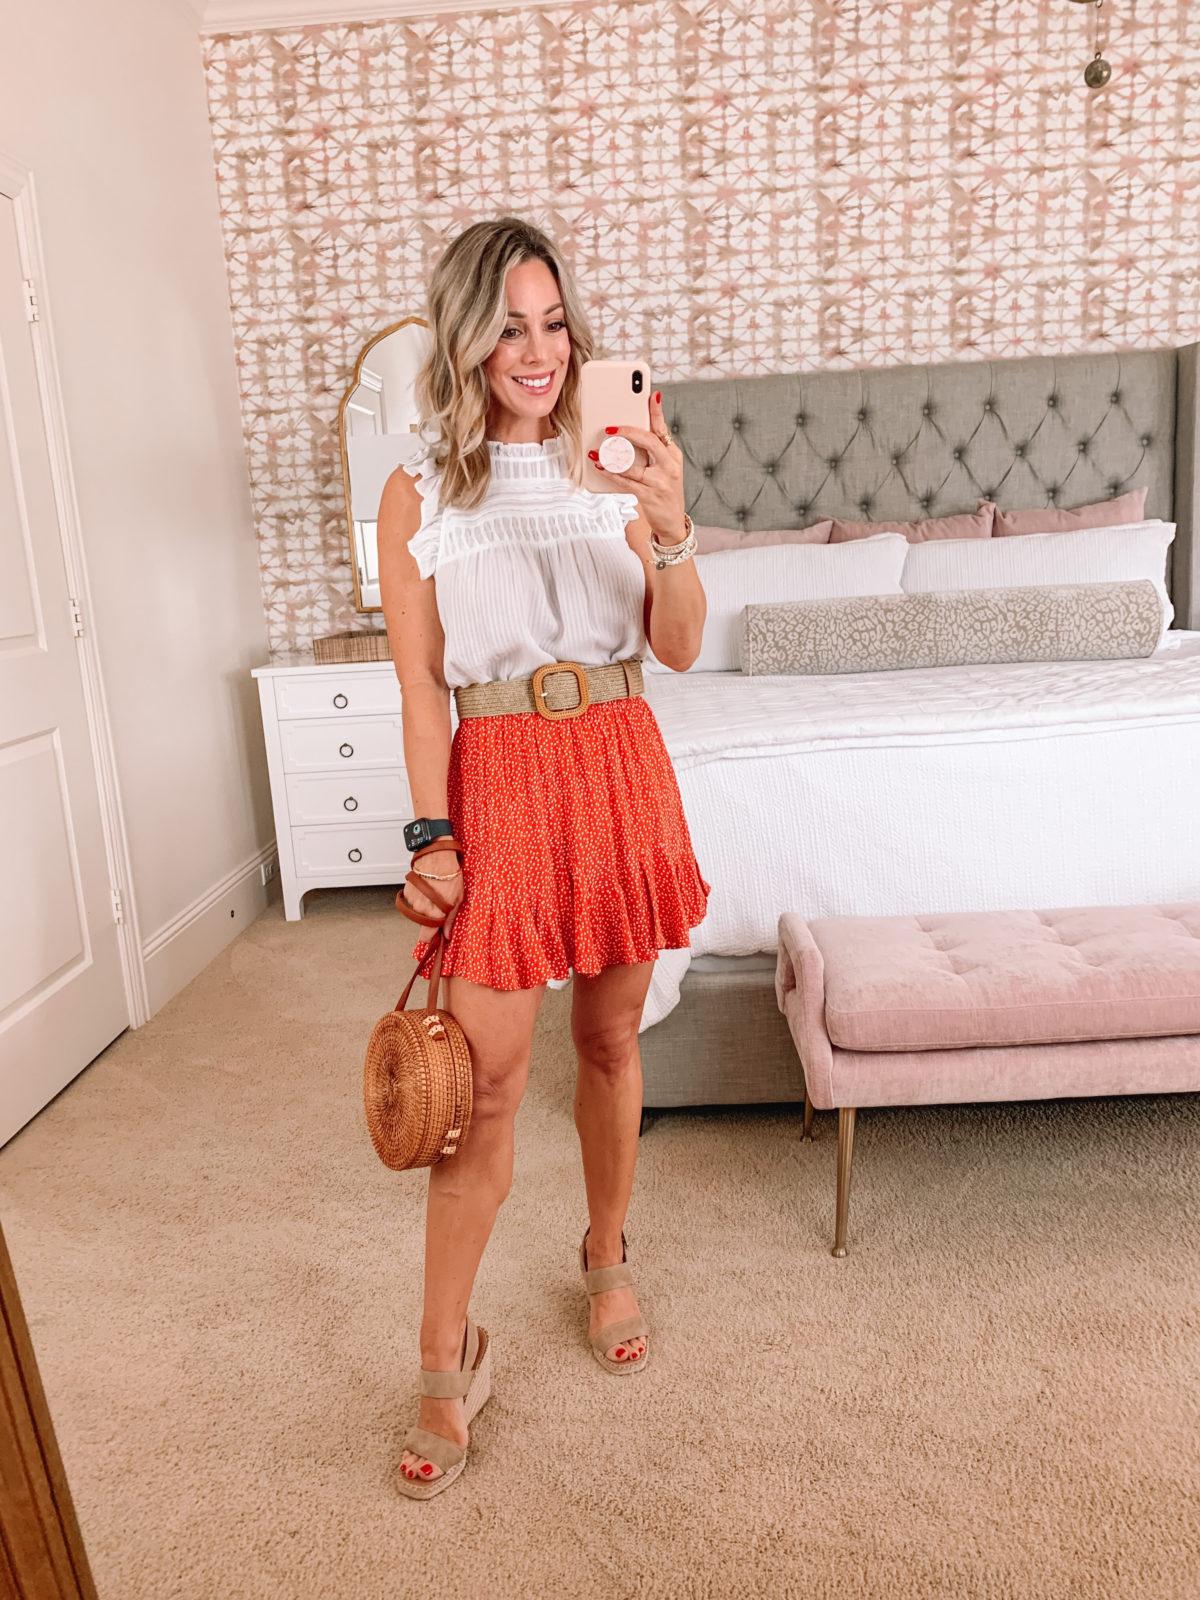 Dressing Room Finds LOFT, White Top, Skirt, Wedges, Woven Crossbody